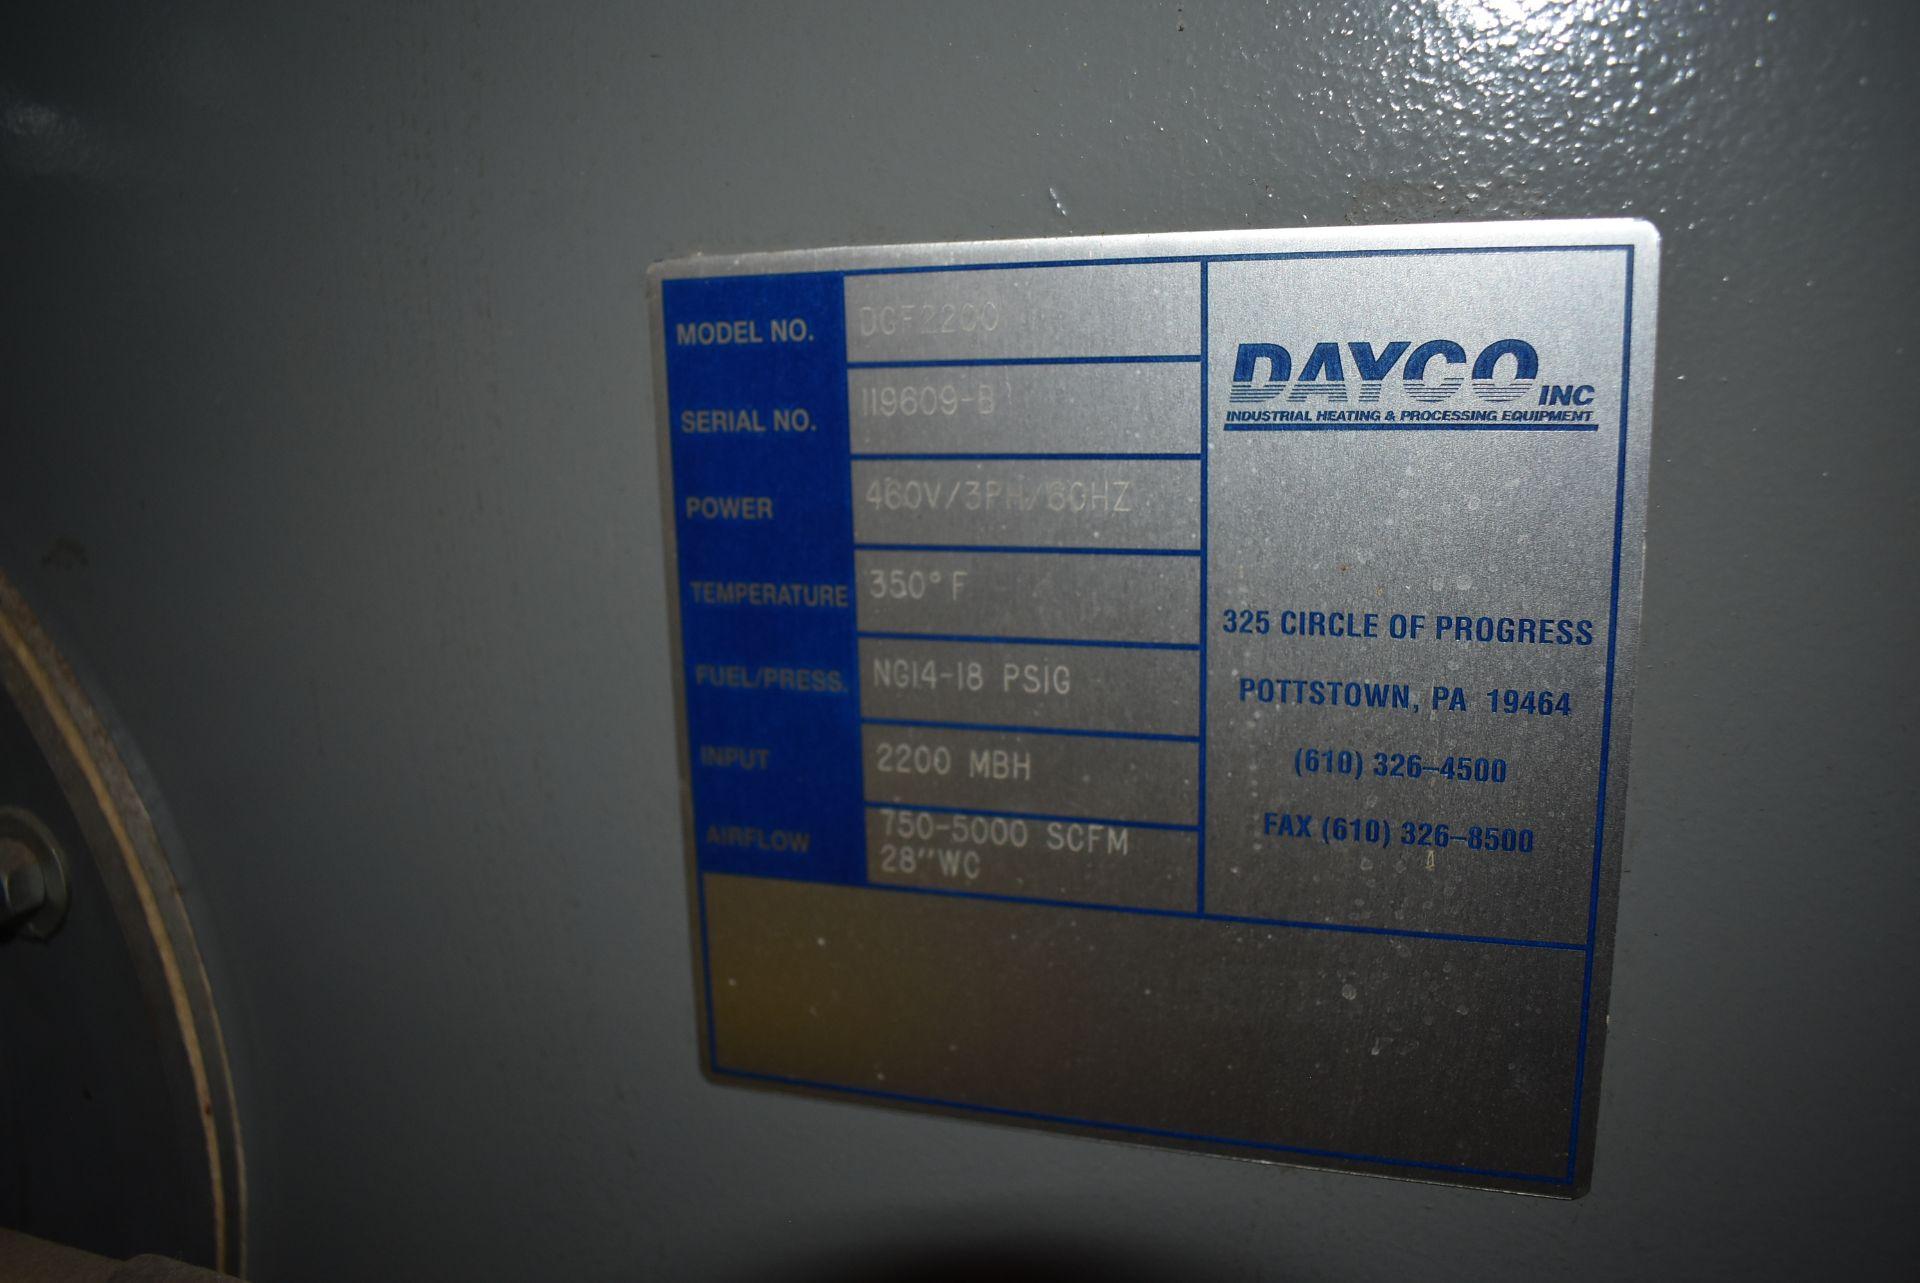 Dayco Model #DFG2200 Direct Fire Handling Unit, SN 119609-B - Image 3 of 5